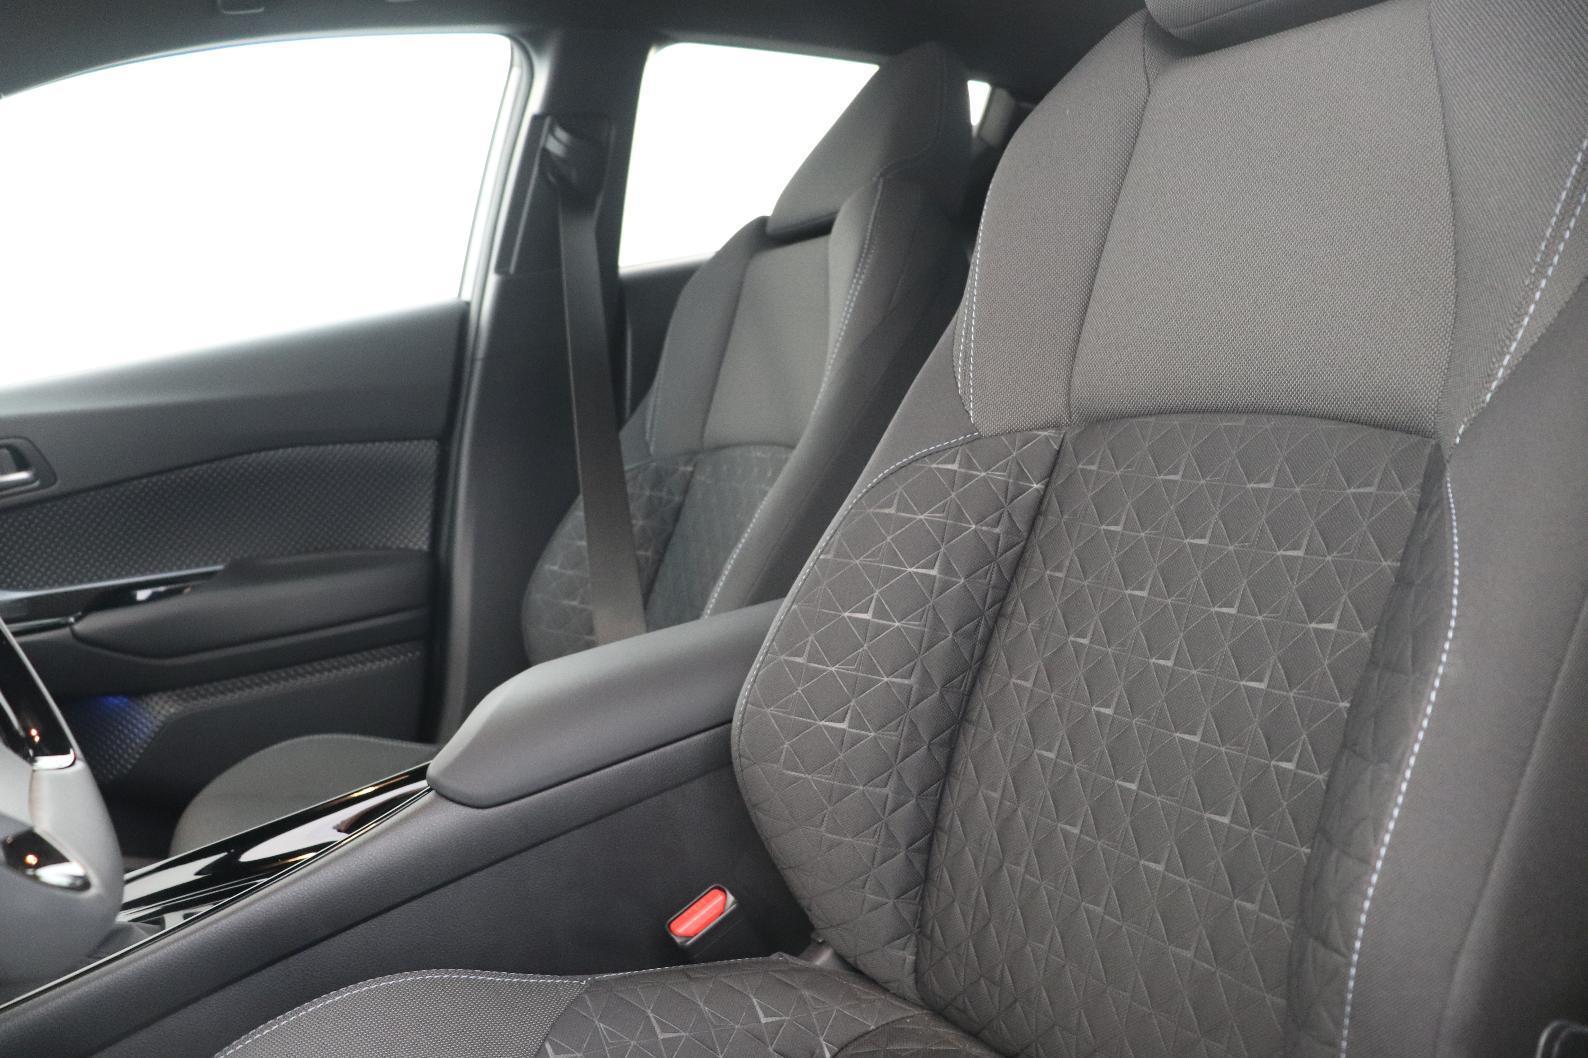 TOYOTA C-HR HYBRIDE MC19 C-HR Hybride 1.8L Edition